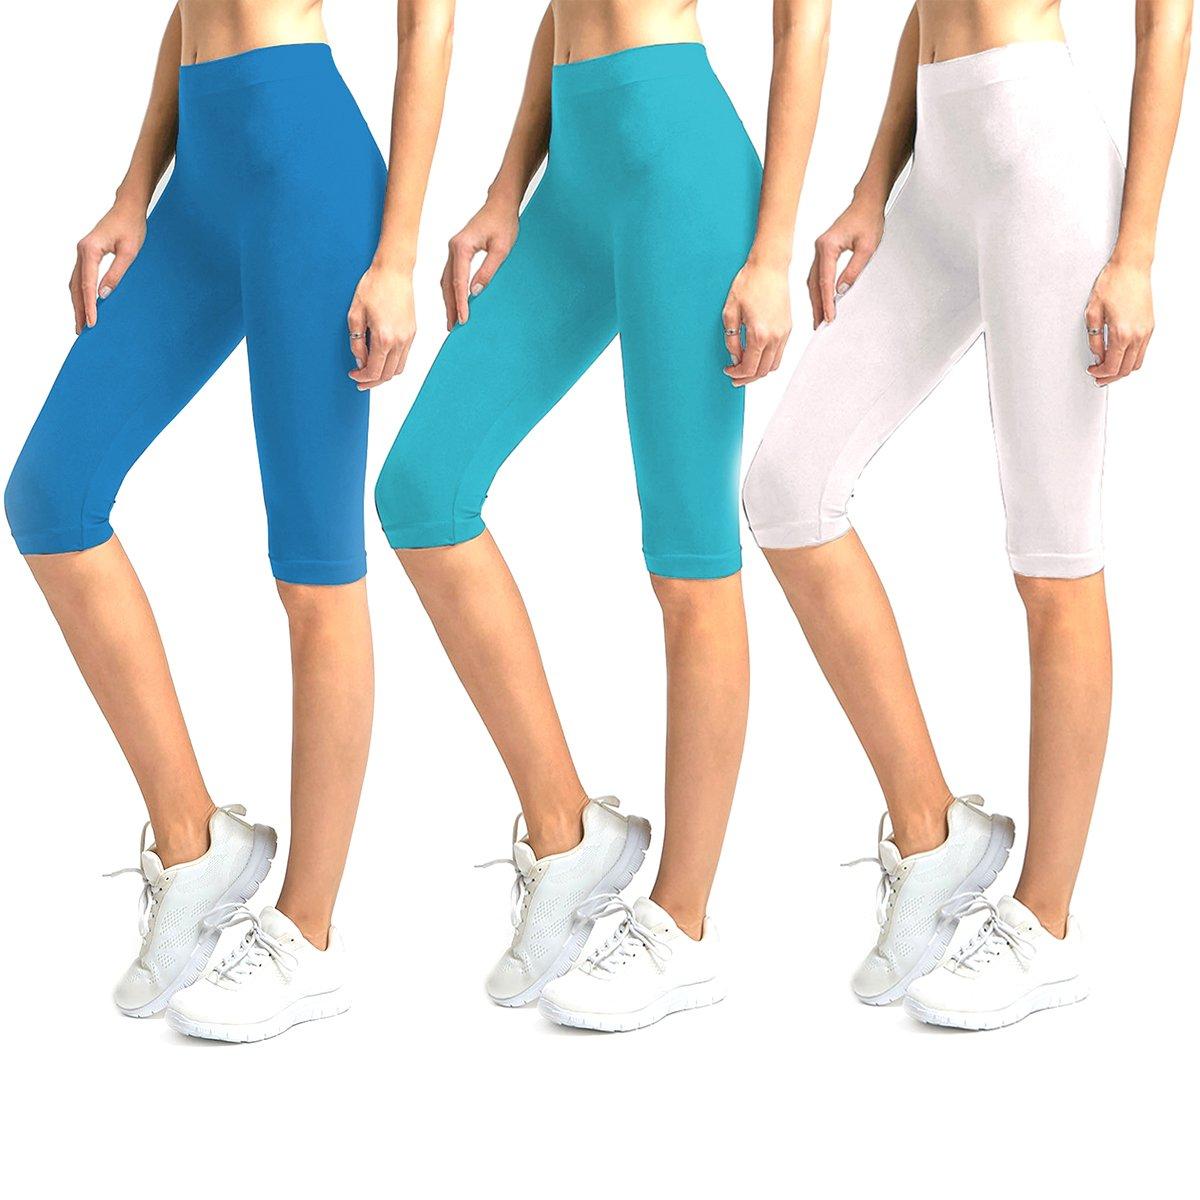 Glass House Apparel 3-Pack Solid Knee Length Spandex Yoga Leggings (Royal Blue, Aqua, White)